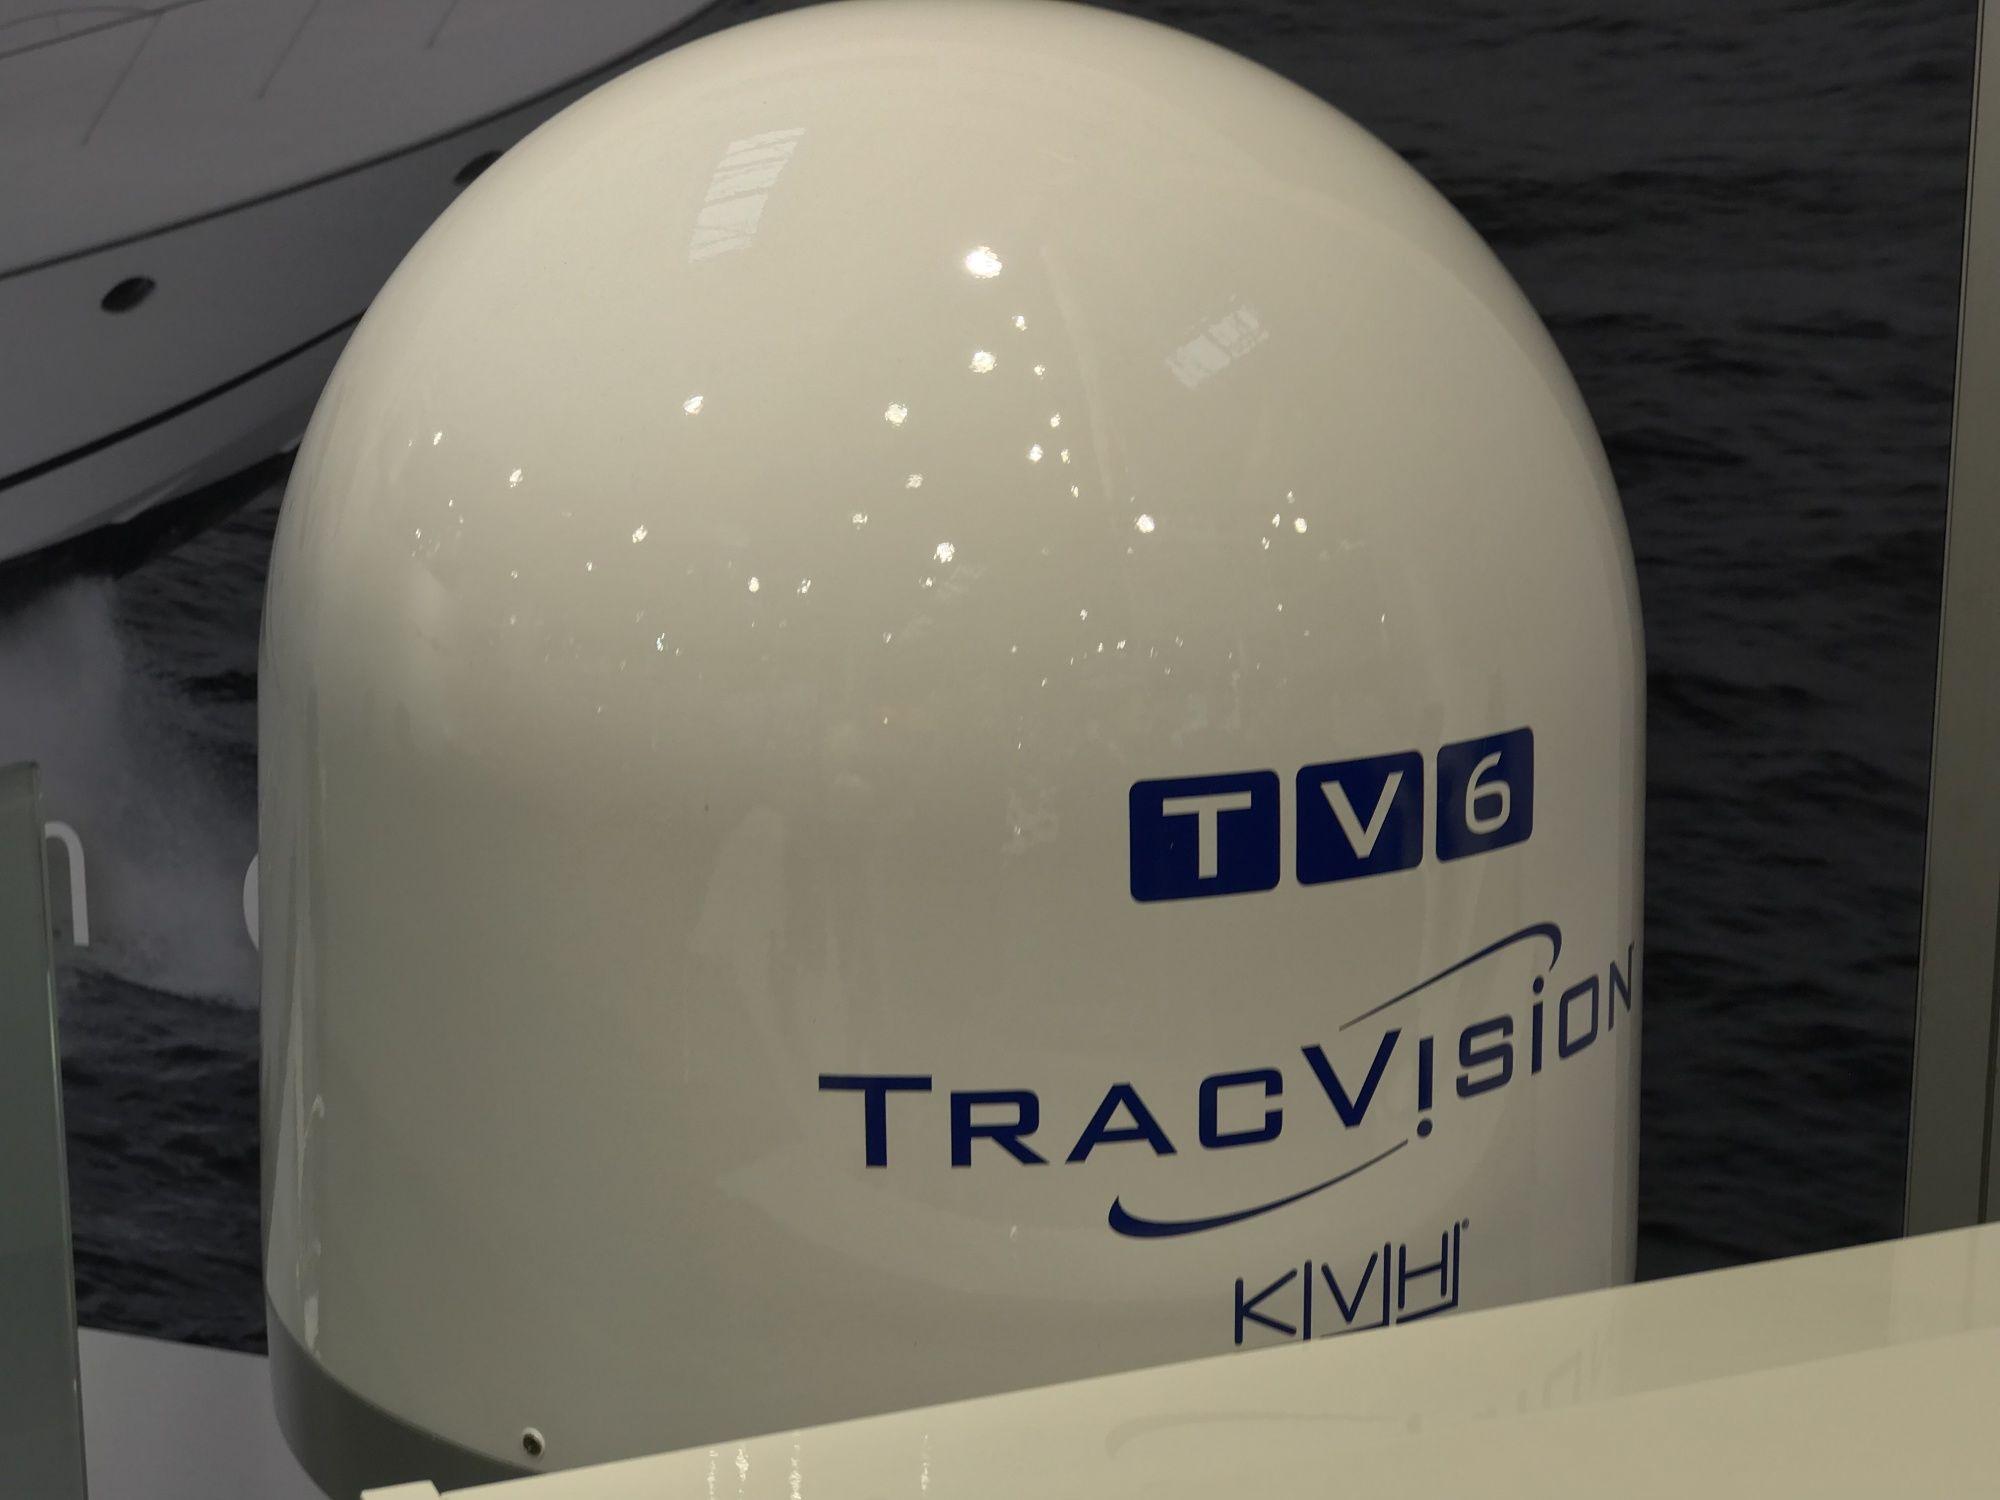 KVH TracVision TV6 mit IP-TV-Hub B & autom. Skew-Einstellung